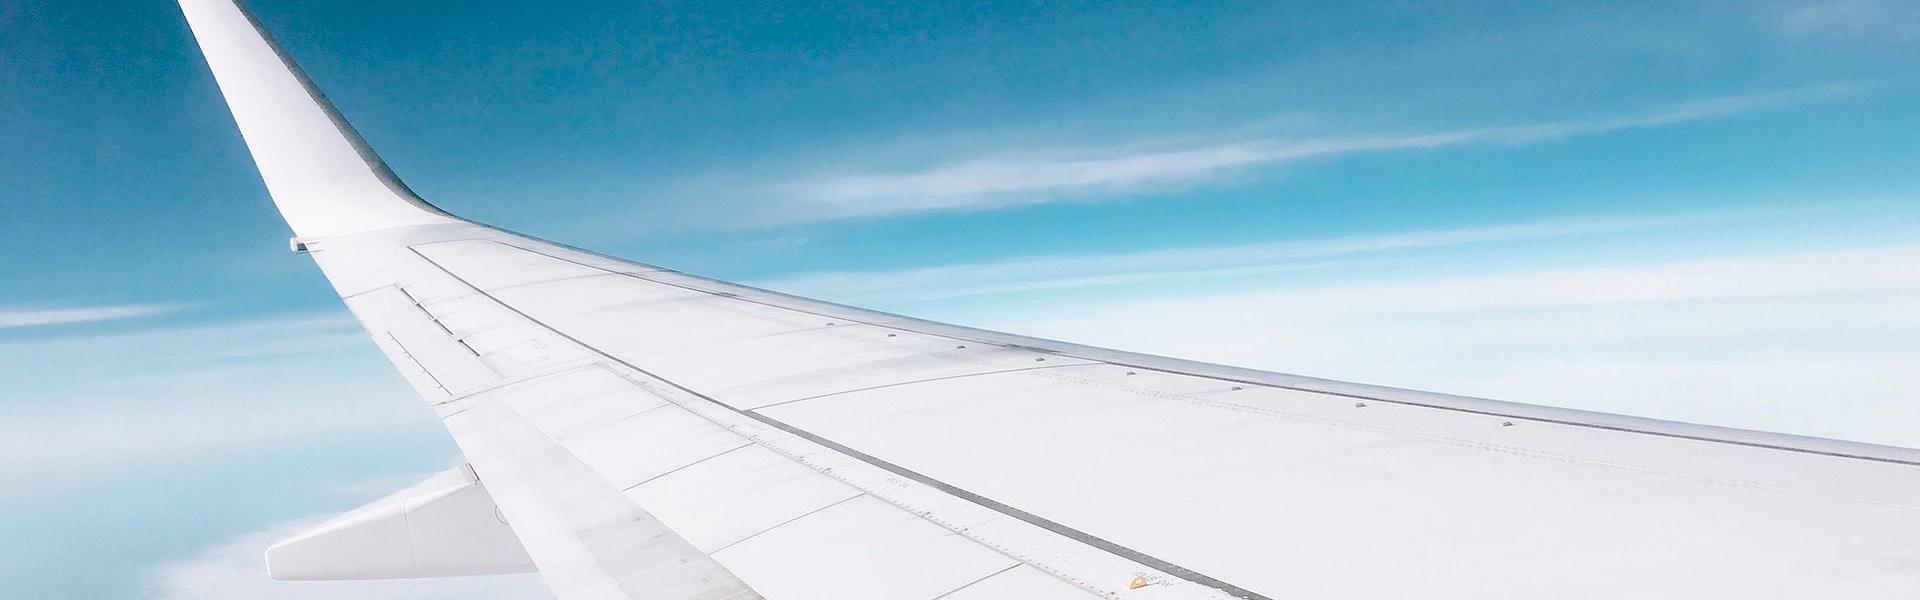 Agencia de viaje Aeromon Tours, vuelos baratos. Paquete turístico Aeromon Tours